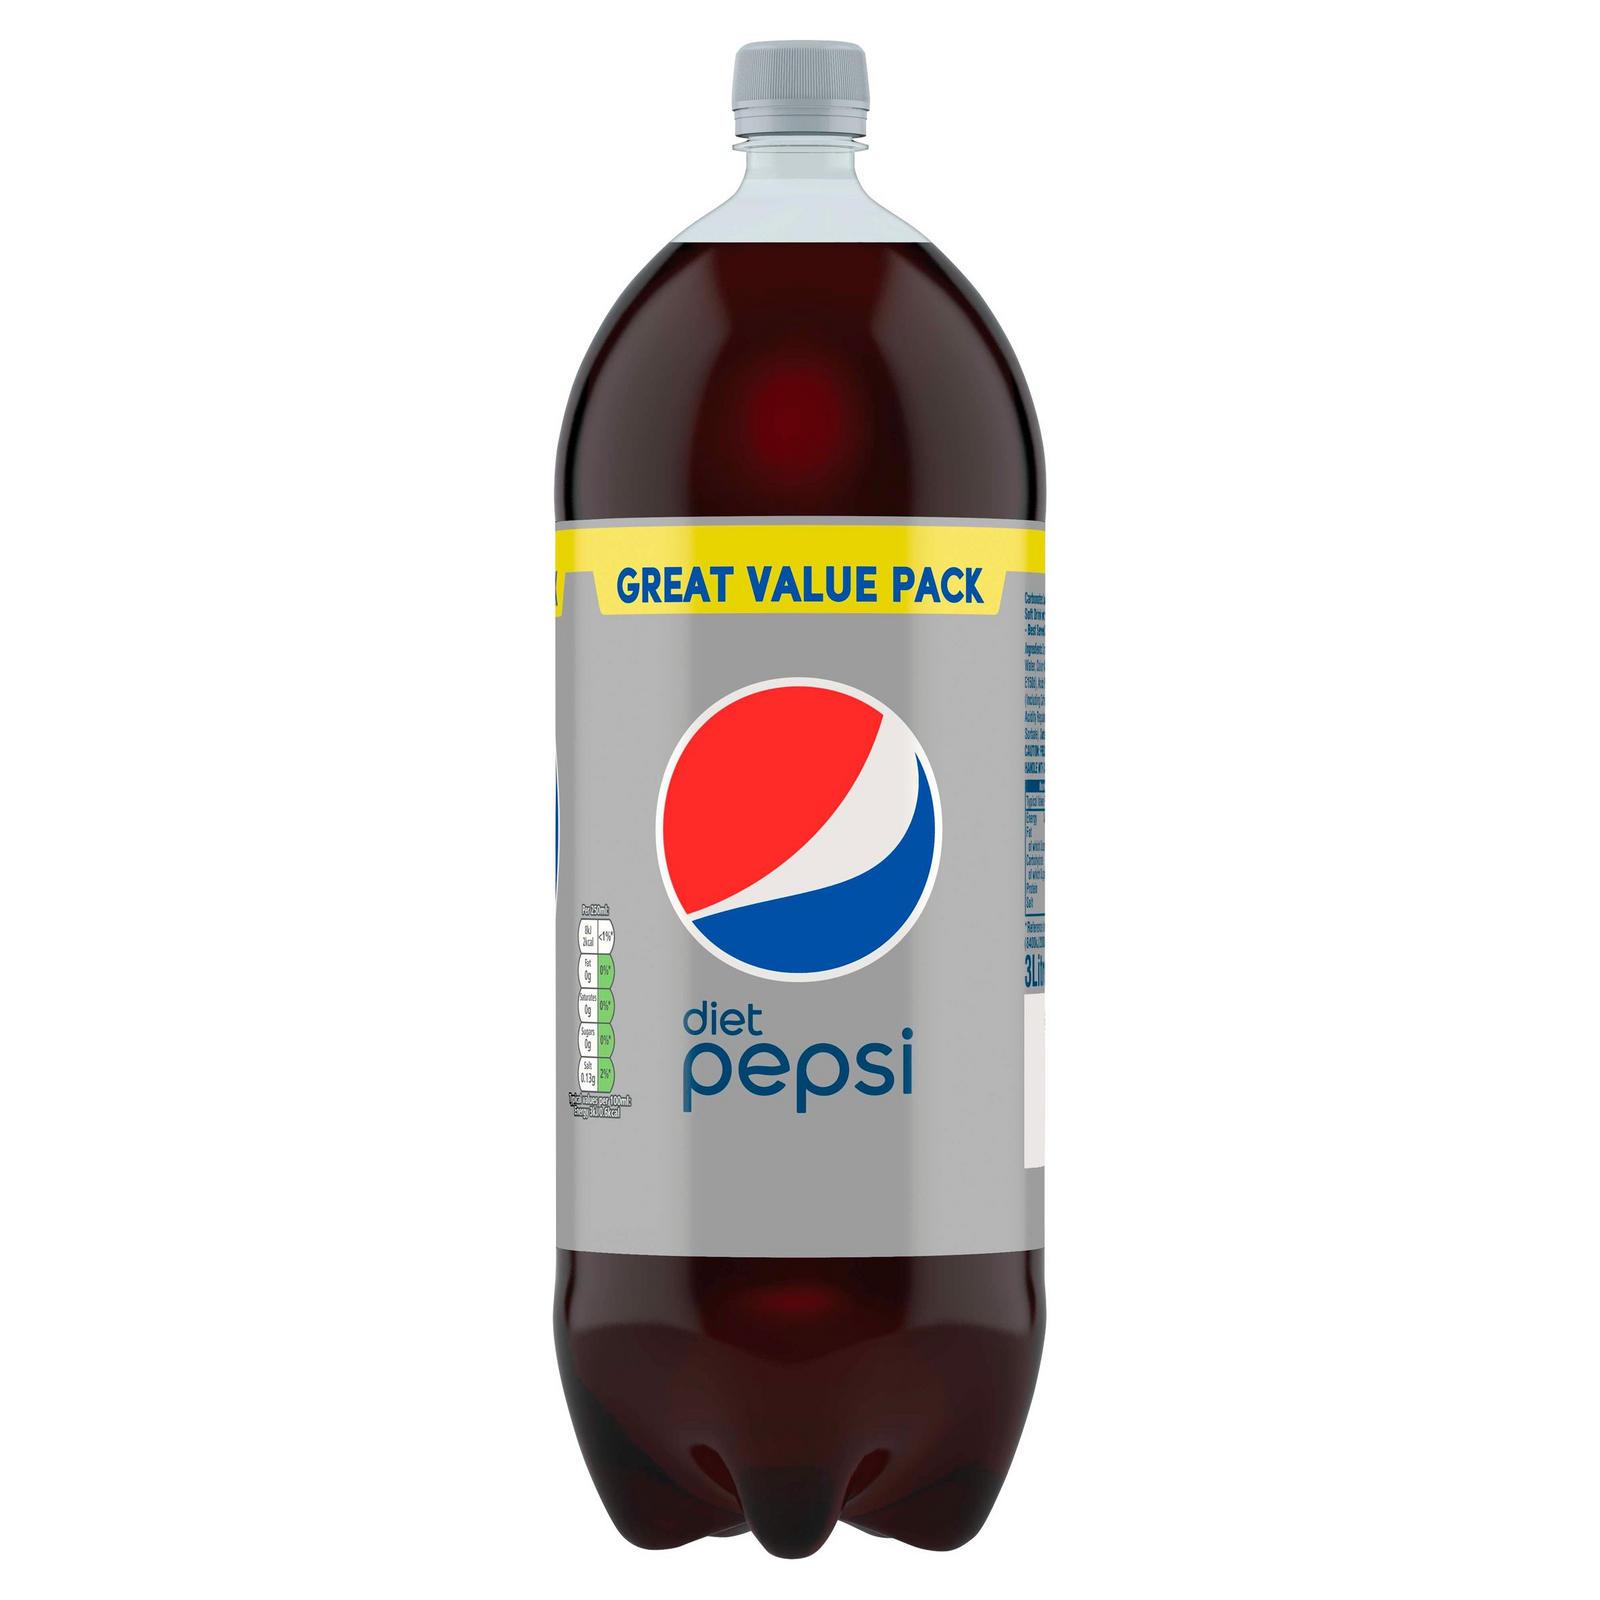 Pepsi Max/Diet Pepsi 3 Litre £1.75 in store @ B&M Bargains Hemel Hempstead